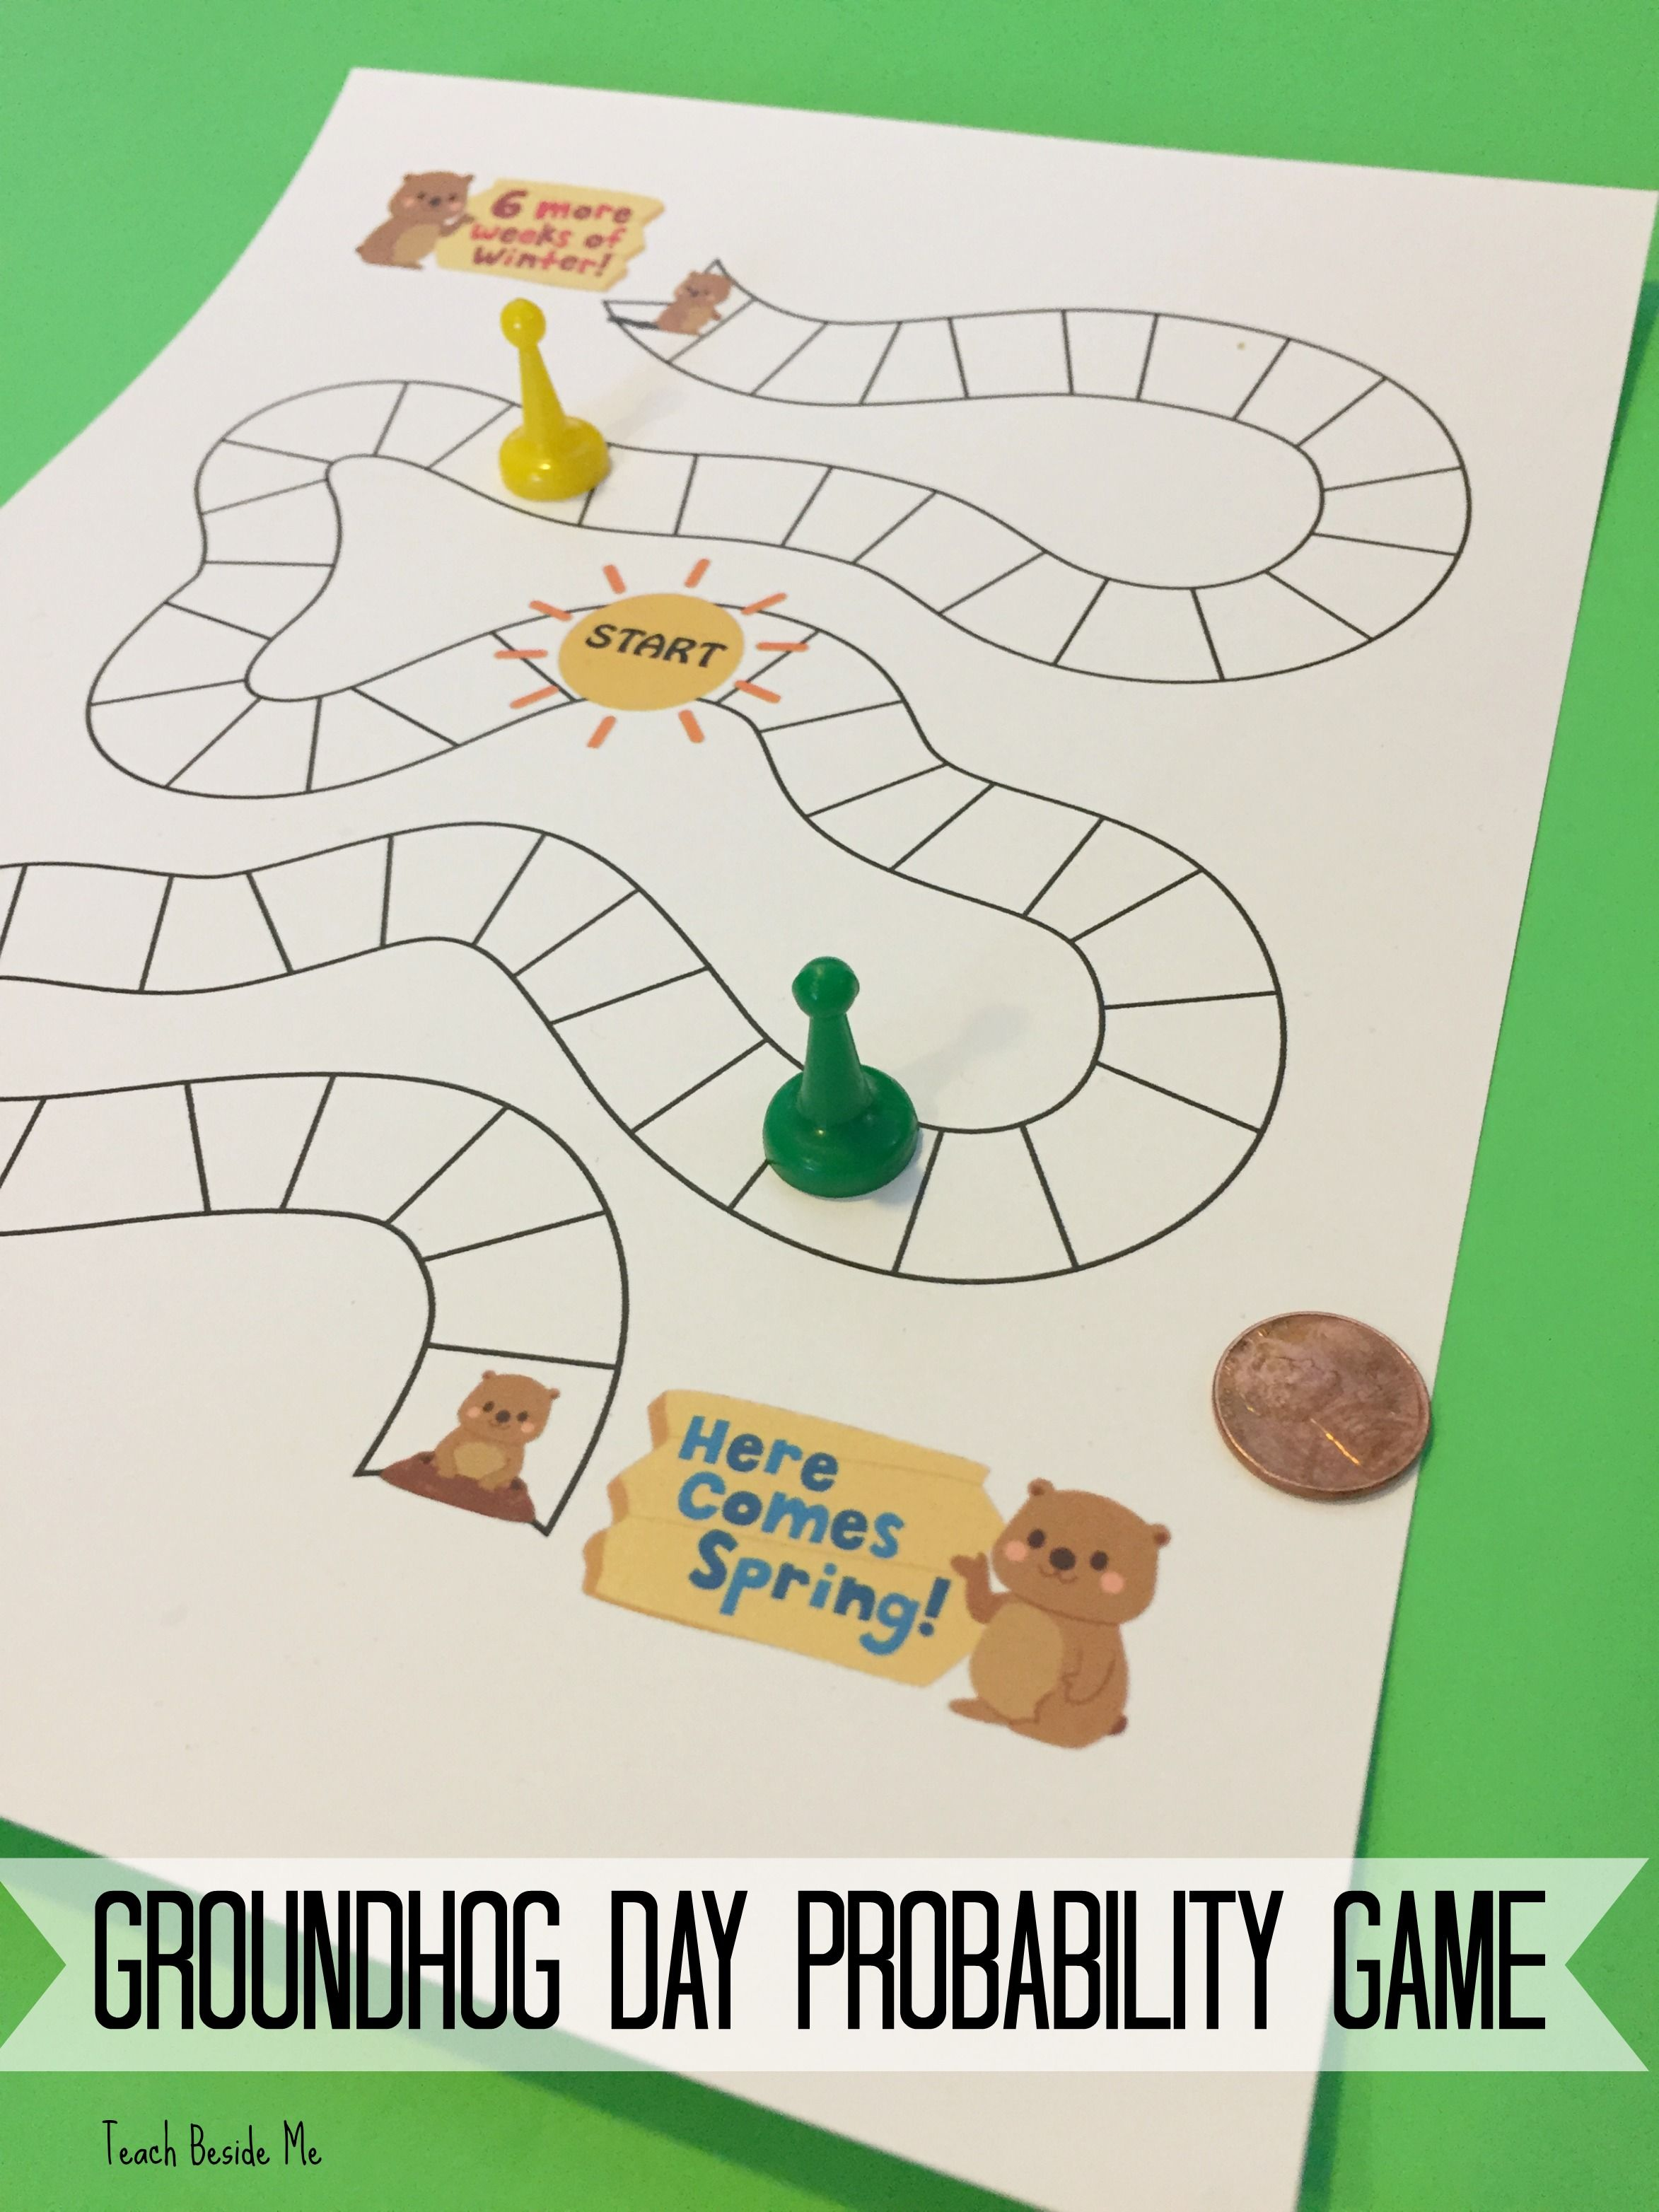 Groundhog Day Probability Game